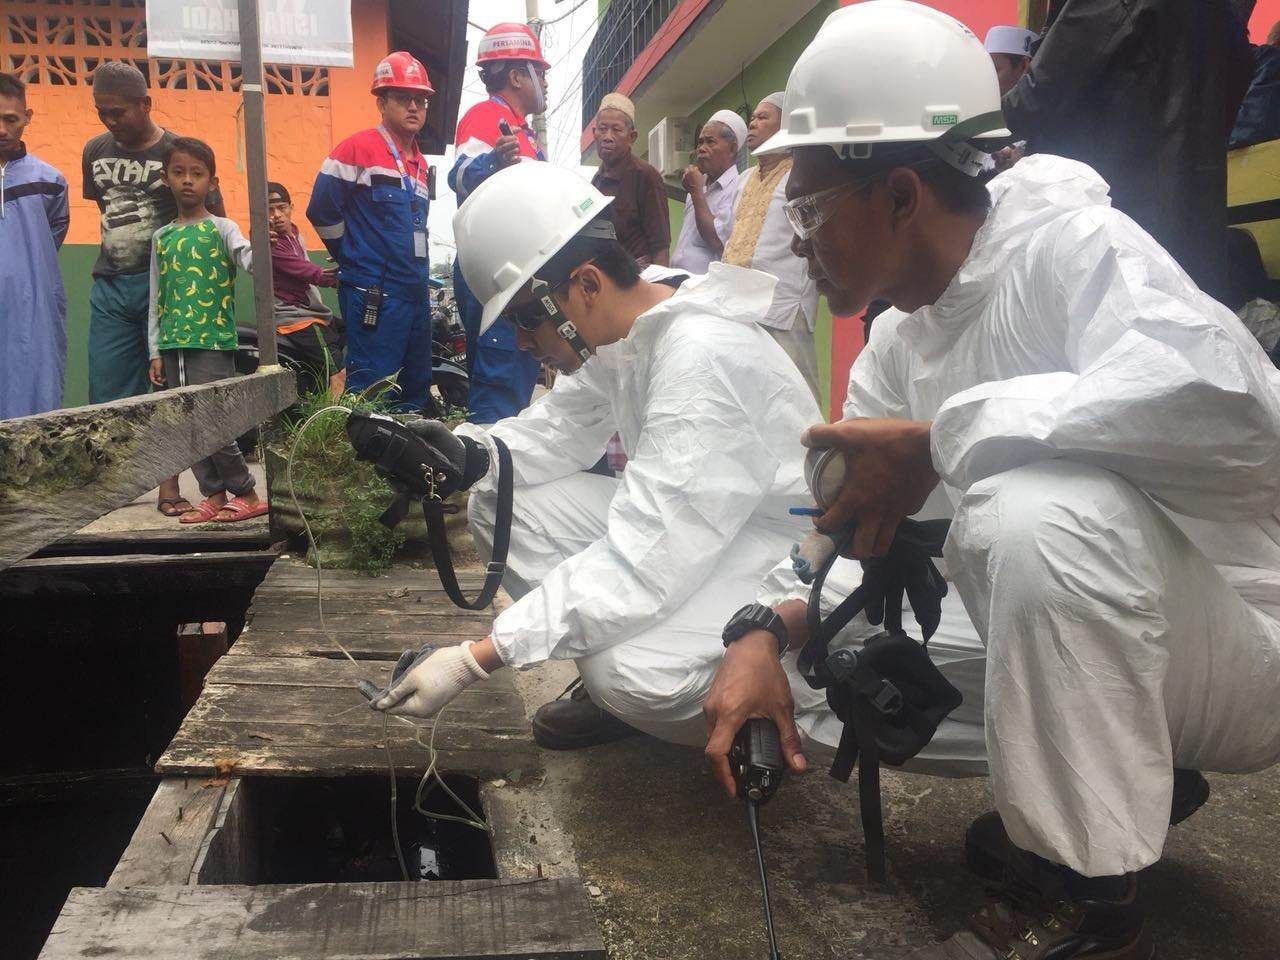 Pertamina adds health posts in Balikpapan to fulfill public health needs